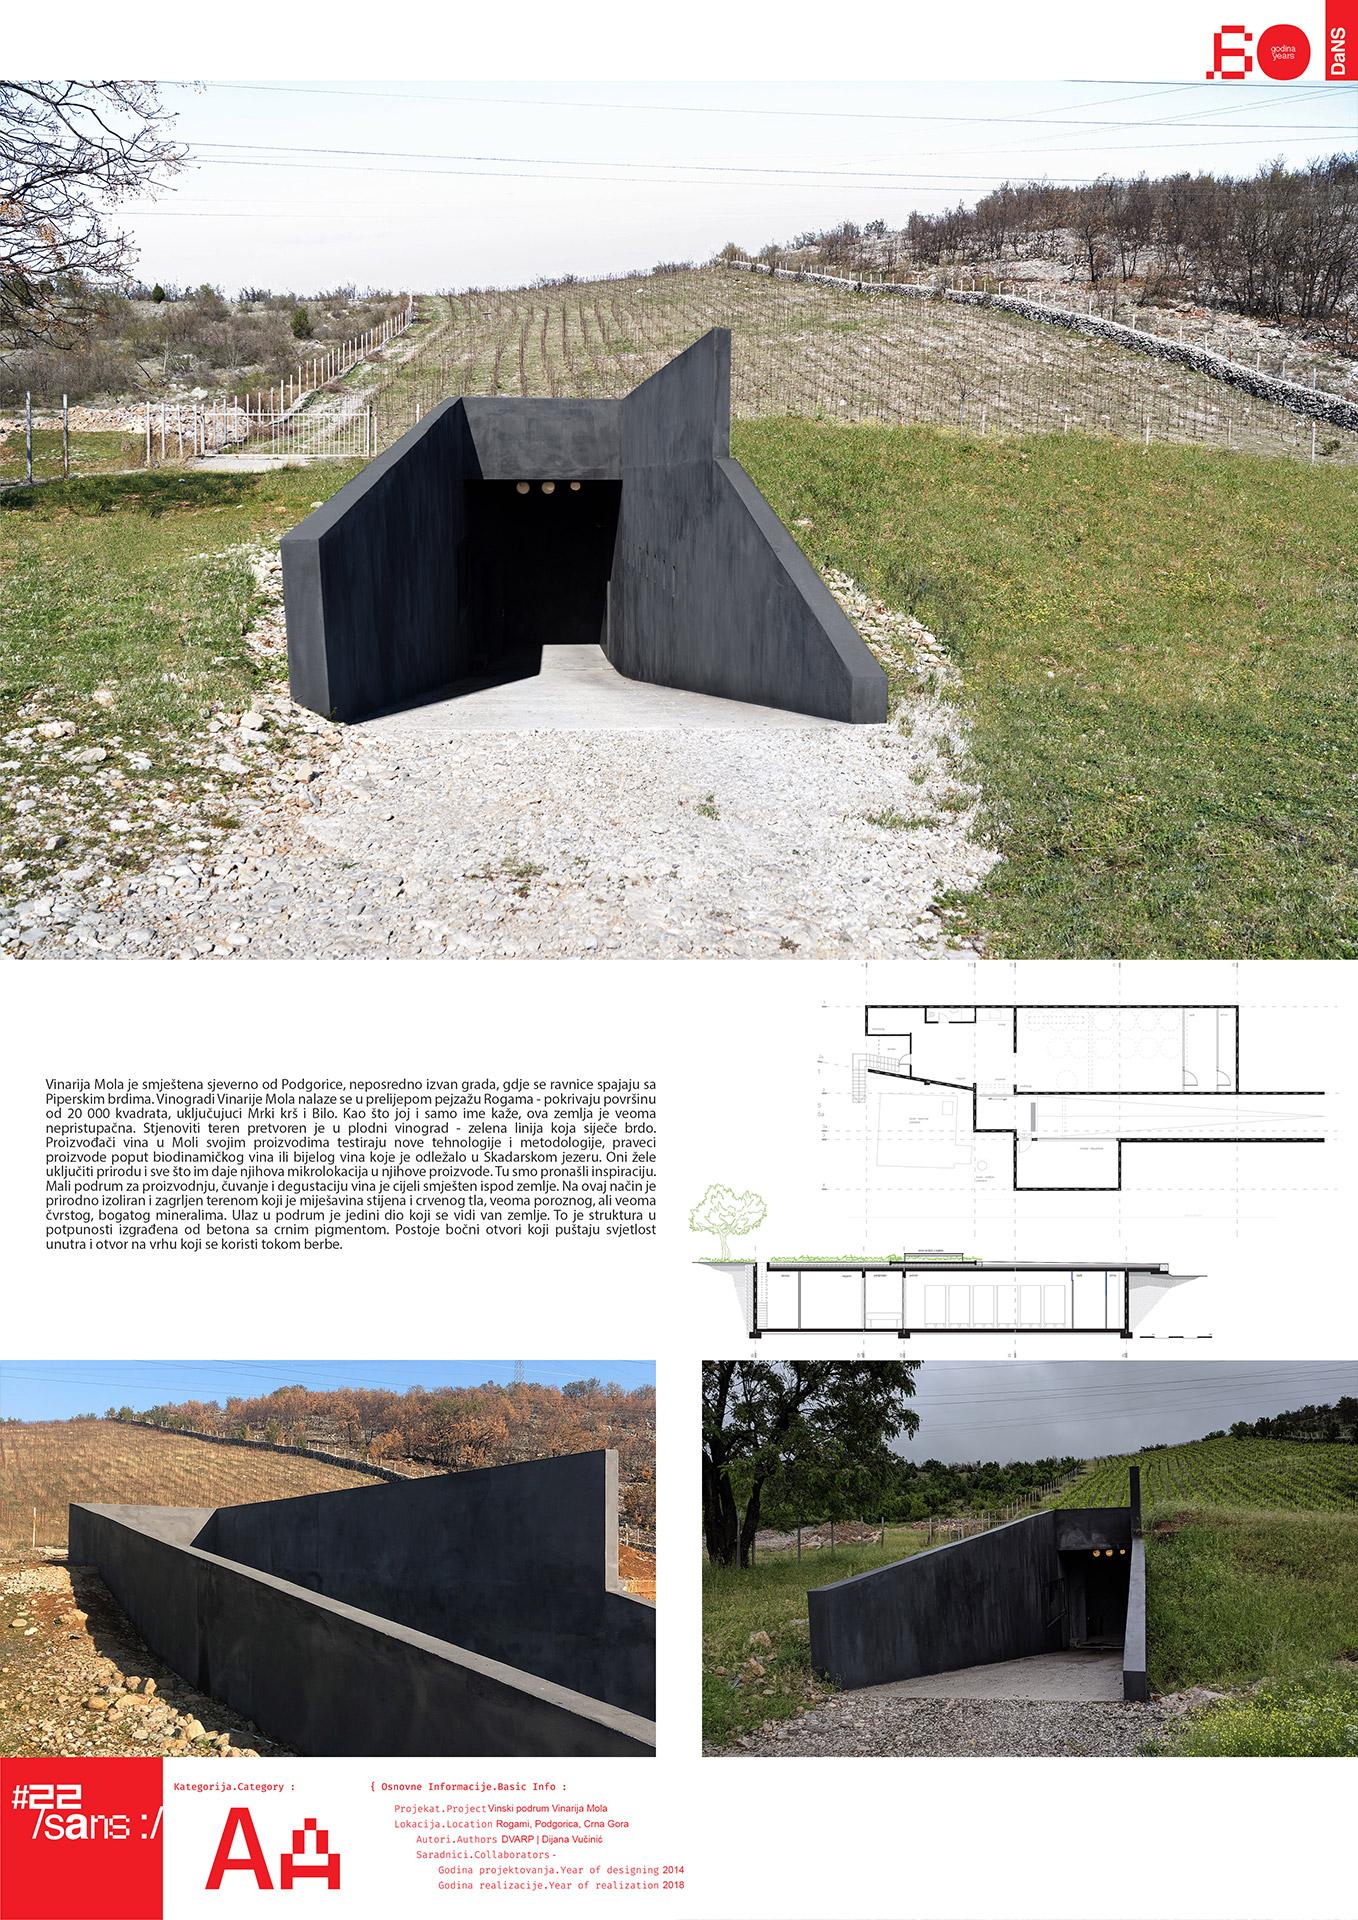 "<p class=""naslov-br"">aa03</p>Vinski podrum Vinarija Mola // Wine Cellar of the Mola Winery"